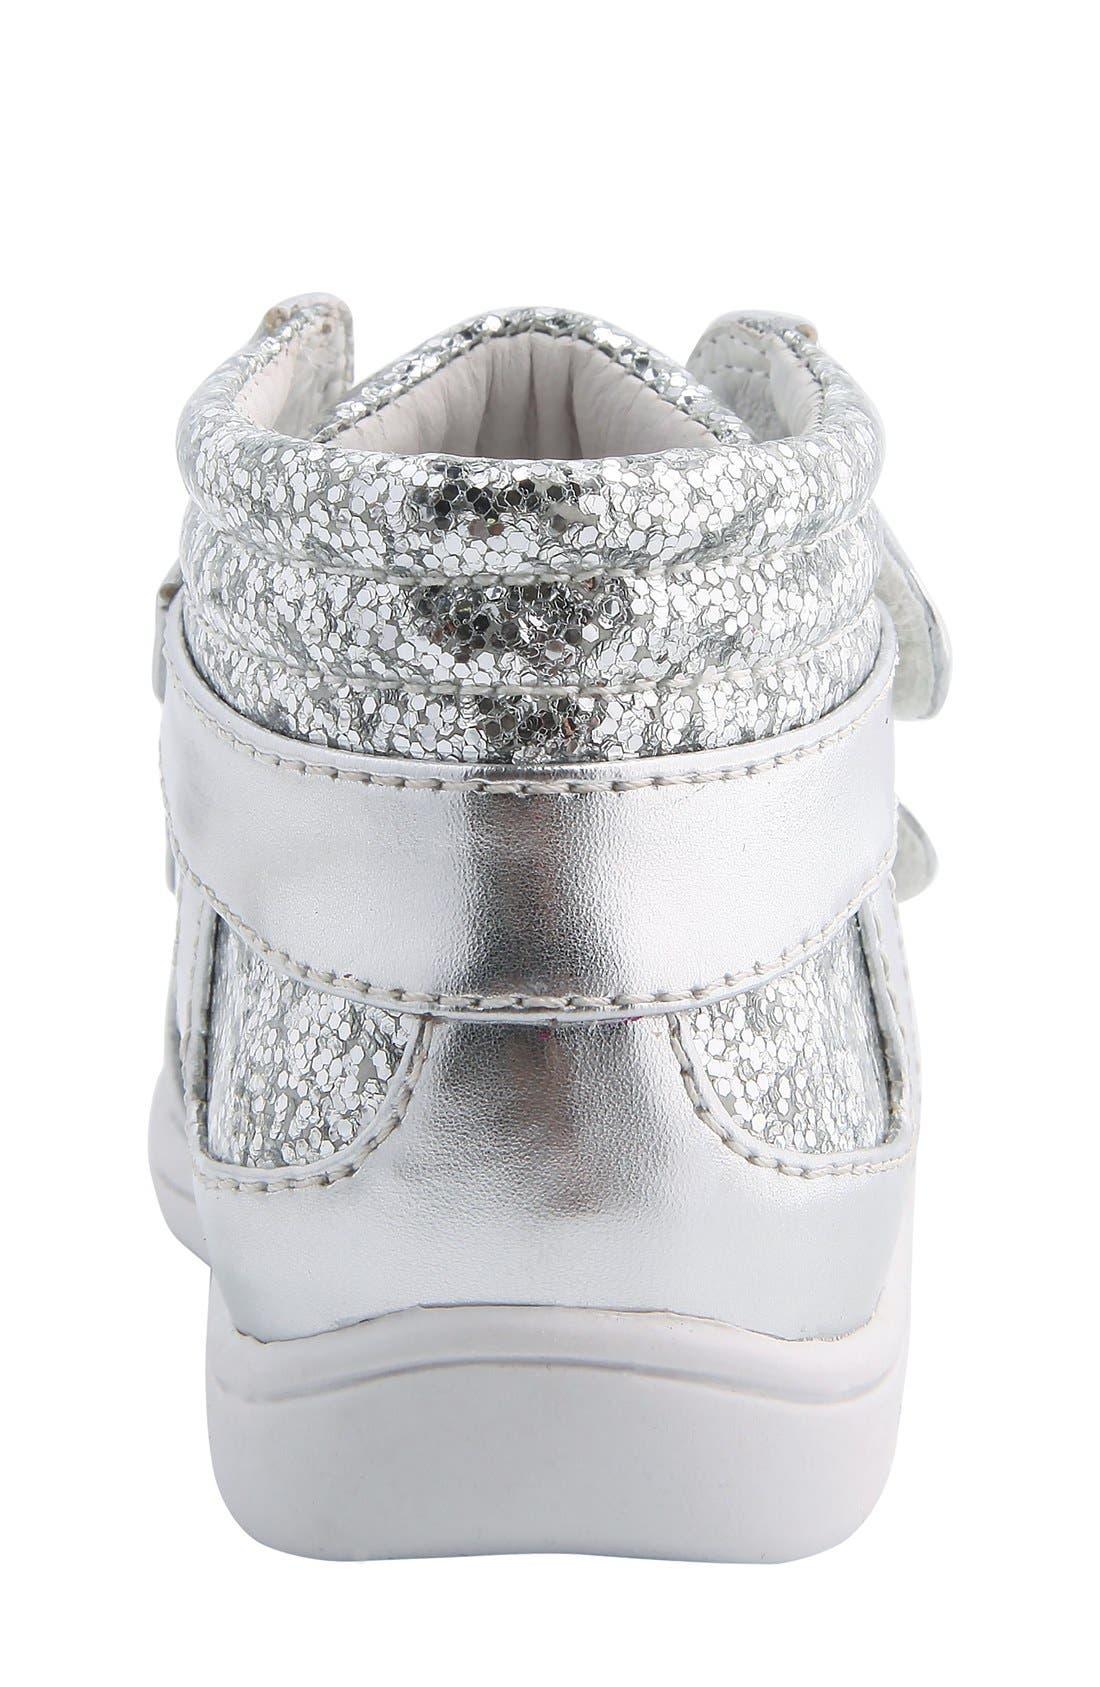 Nina 'Stardust' Metallic High Top Sneaker,                             Alternate thumbnail 4, color,                             Silver Metallic